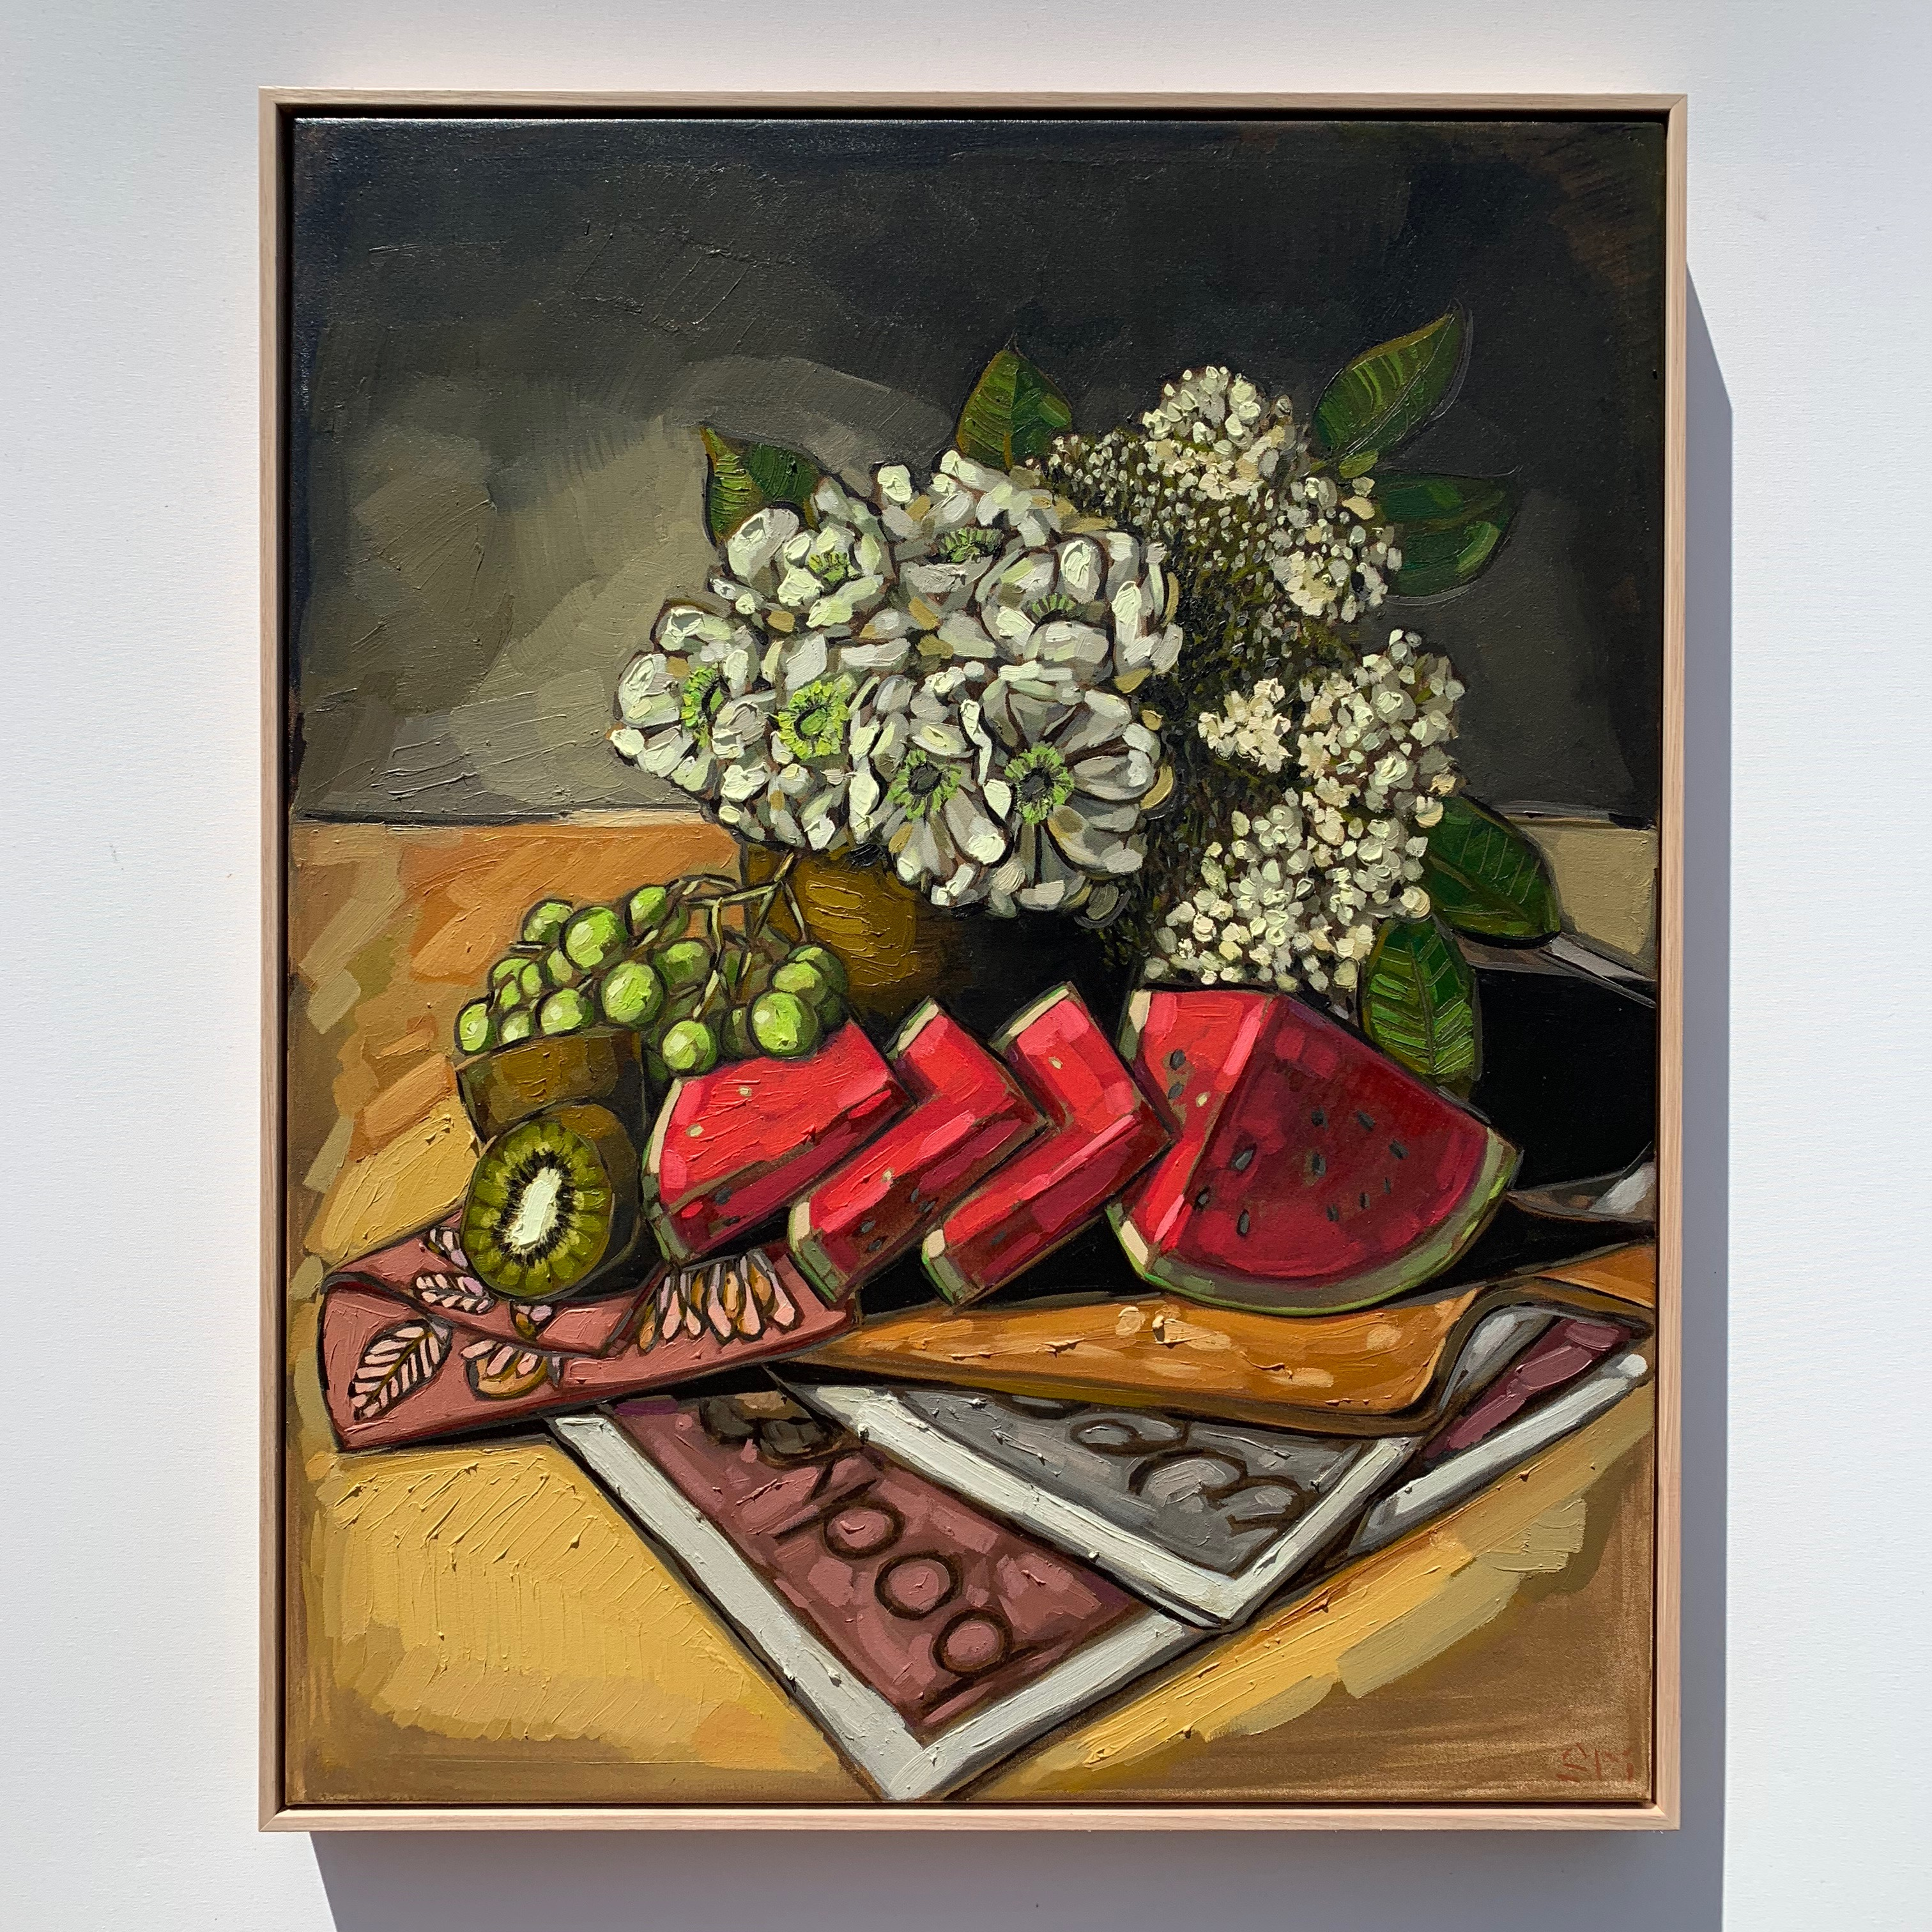 Sam Michelle 'Spring Picnics' 83x68cm